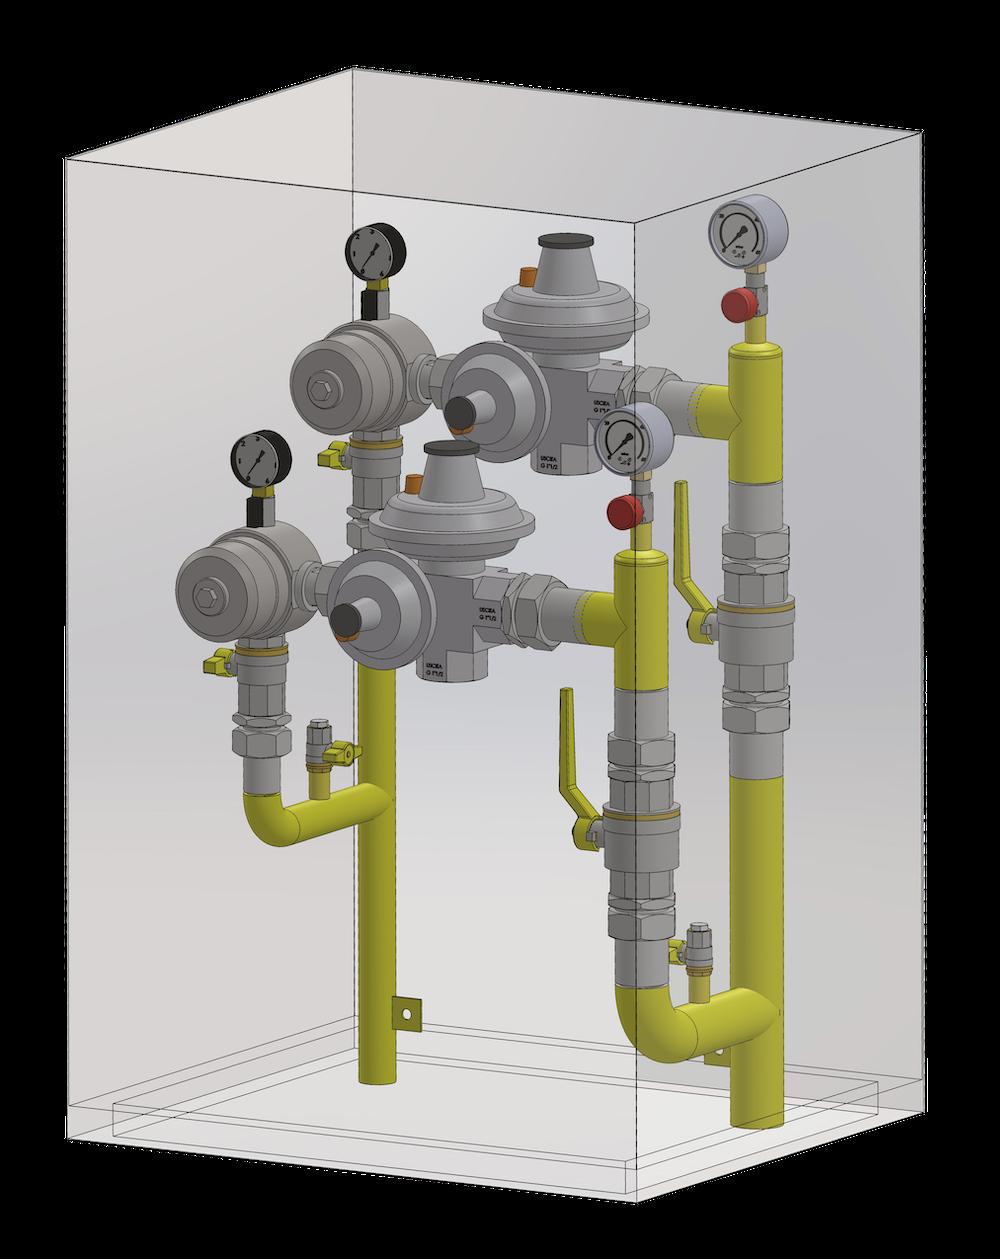 Pegoraro Gas Technologies - Apparecchiature gas metano, GPL, gas verdi